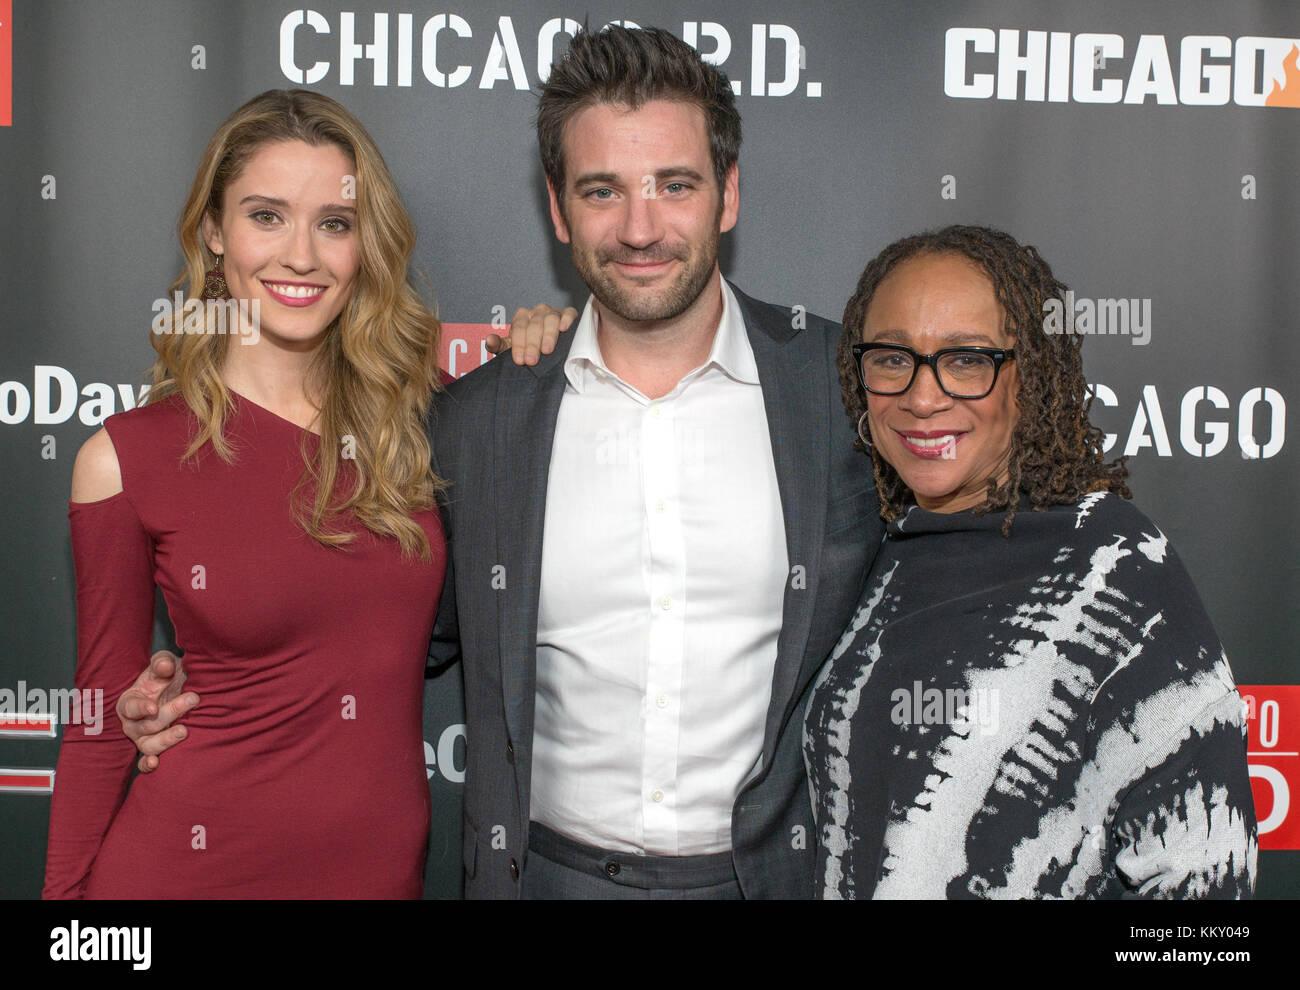 Chicago med cast members dating